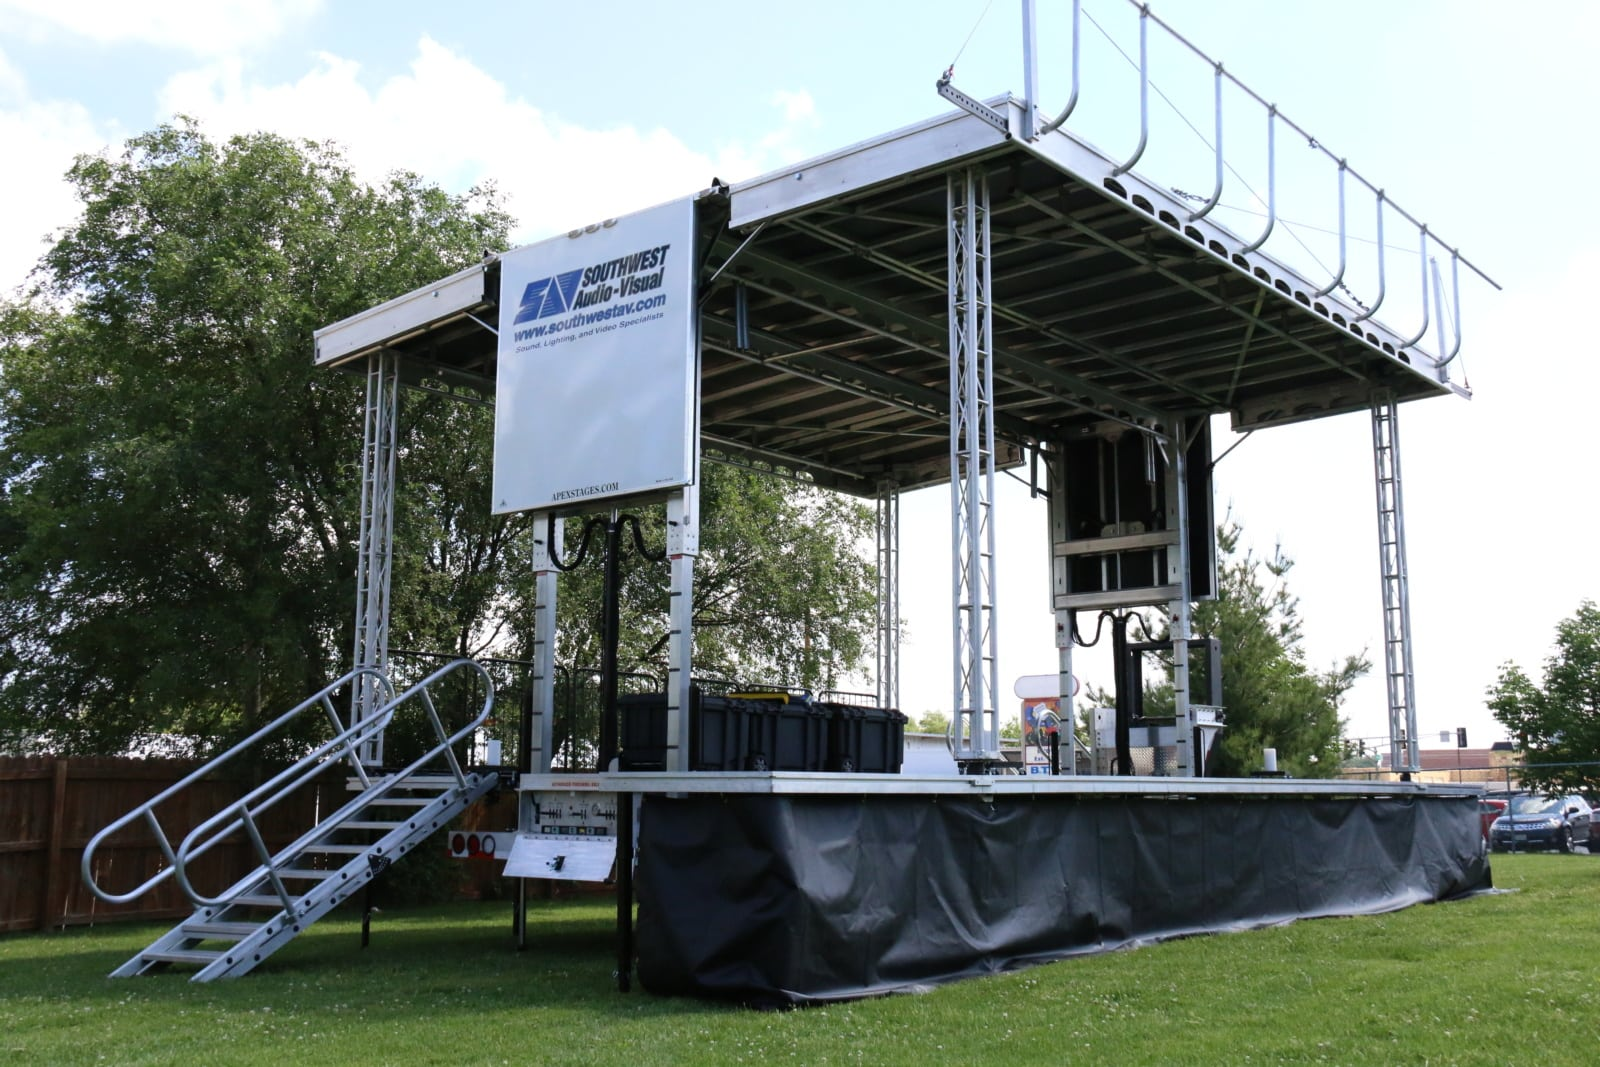 Apex 2420 Mobile Stage - Southwest Audio-Visual